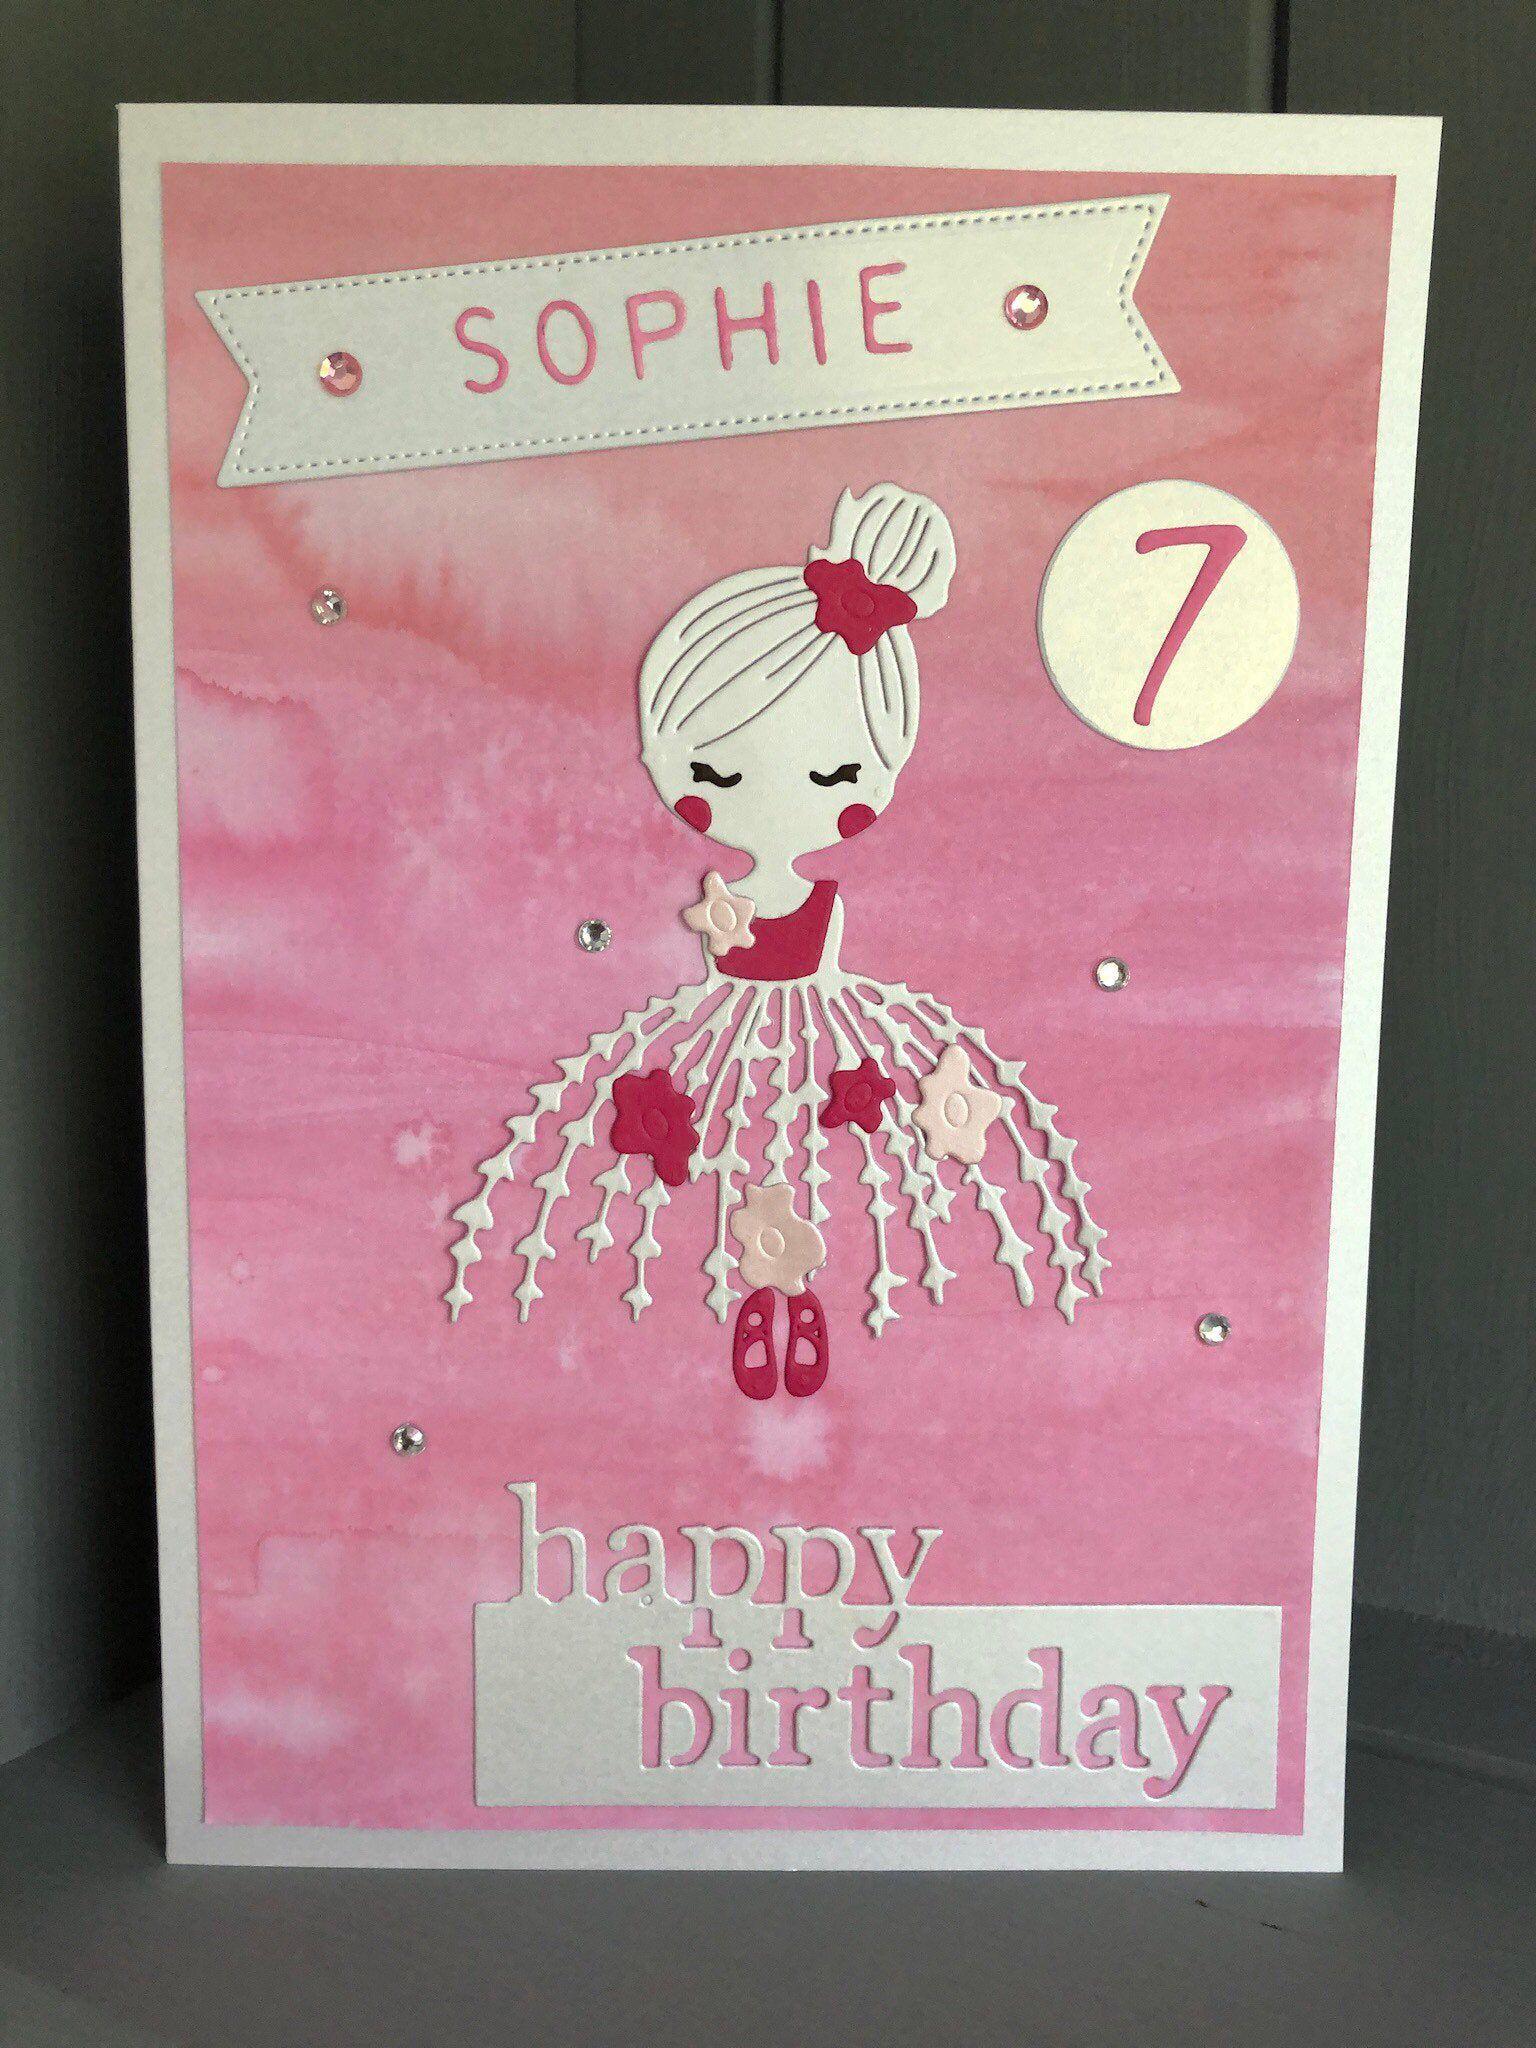 Ballerina Birthday Card Personalised Handcrafted Age Hand Etsy Card Making Birthday 65th Birthday Cards Kids Birthday Cards